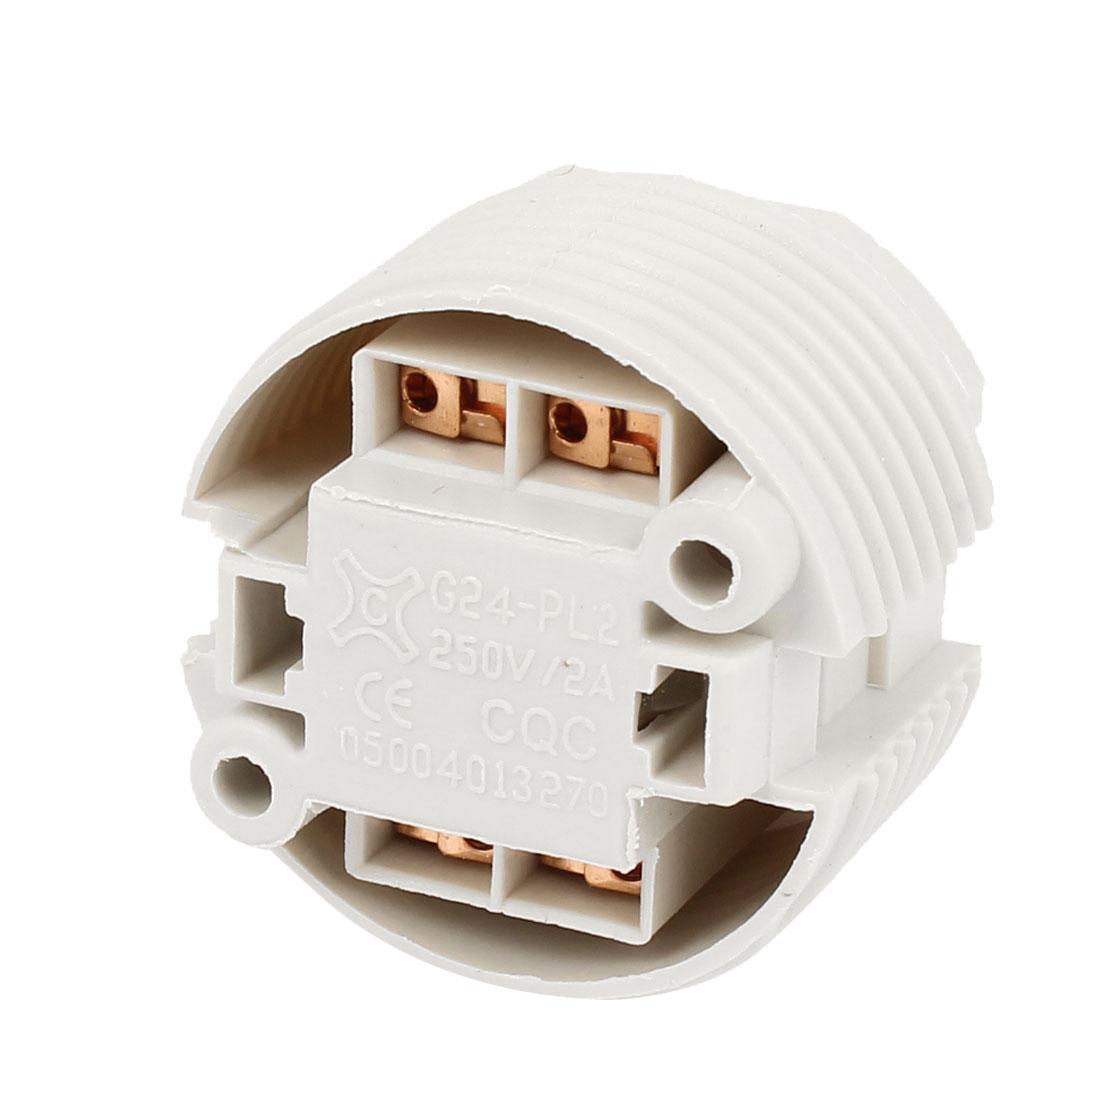 AC 250V 2A G24 Socket 4-pin Energy Saving Lamp Holder Adapter